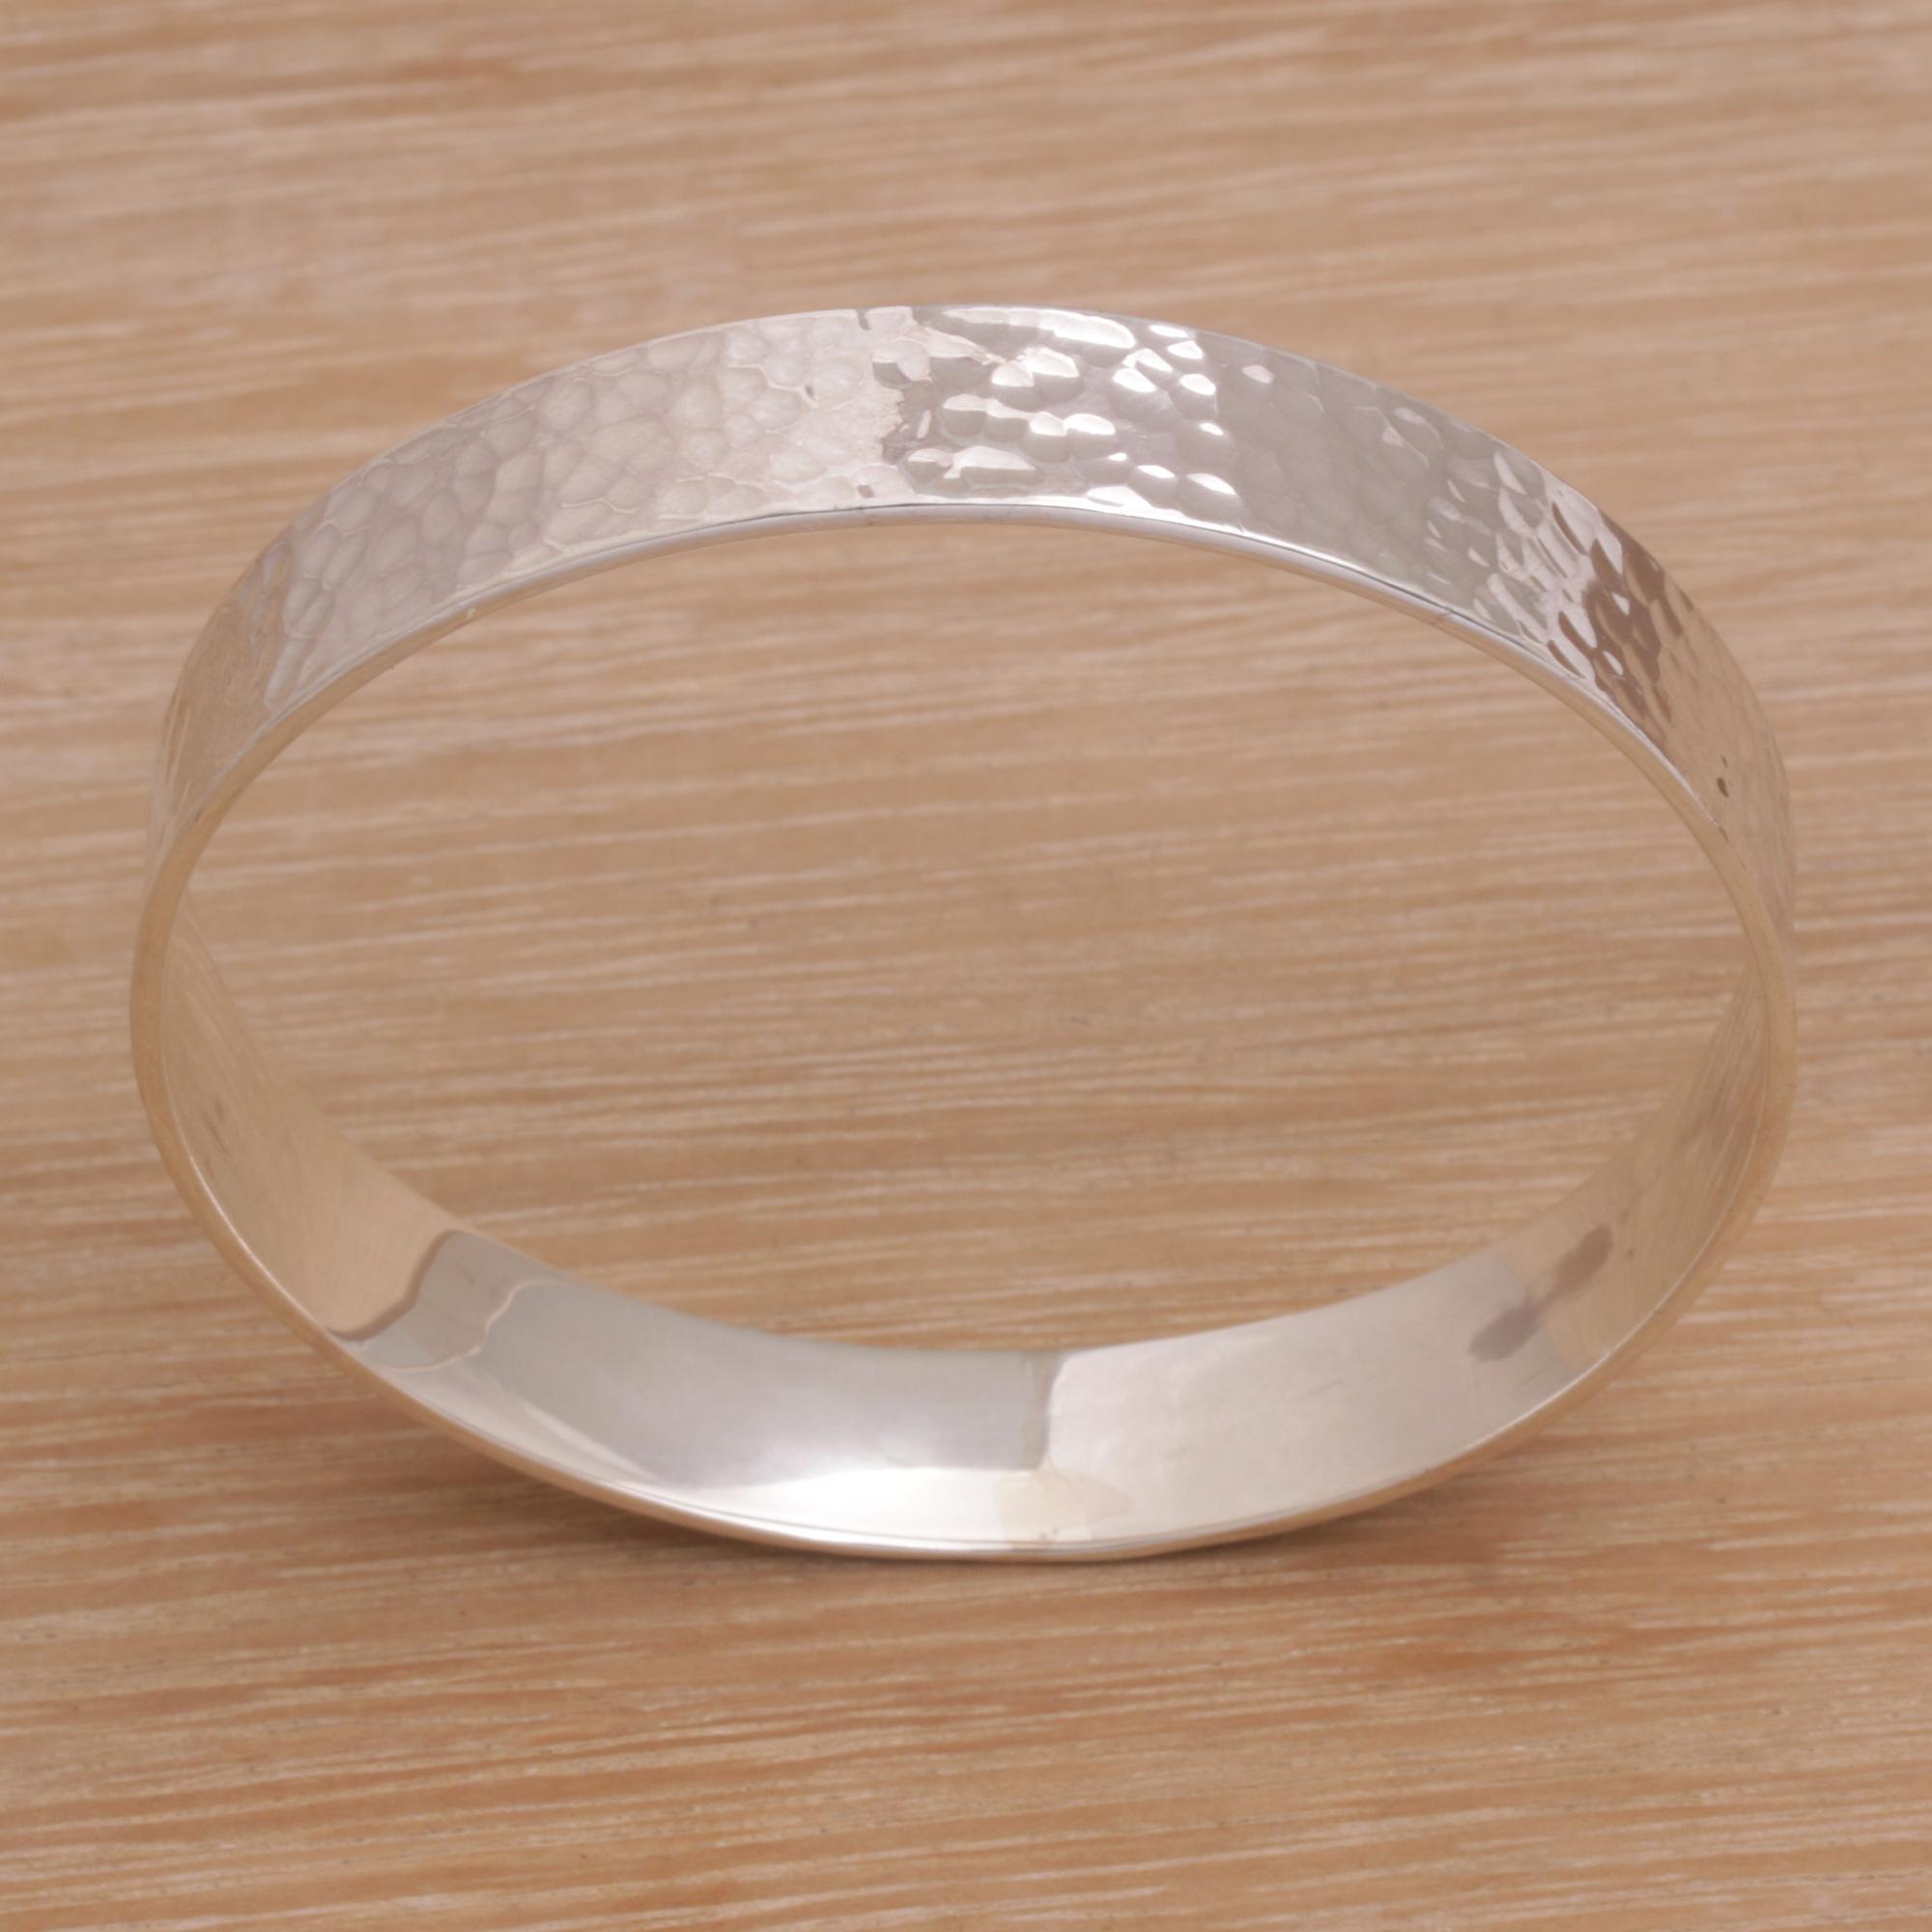 Silver Heart Charm Bangle Handmade Sterling Silver Hammered Bracelet Bangle